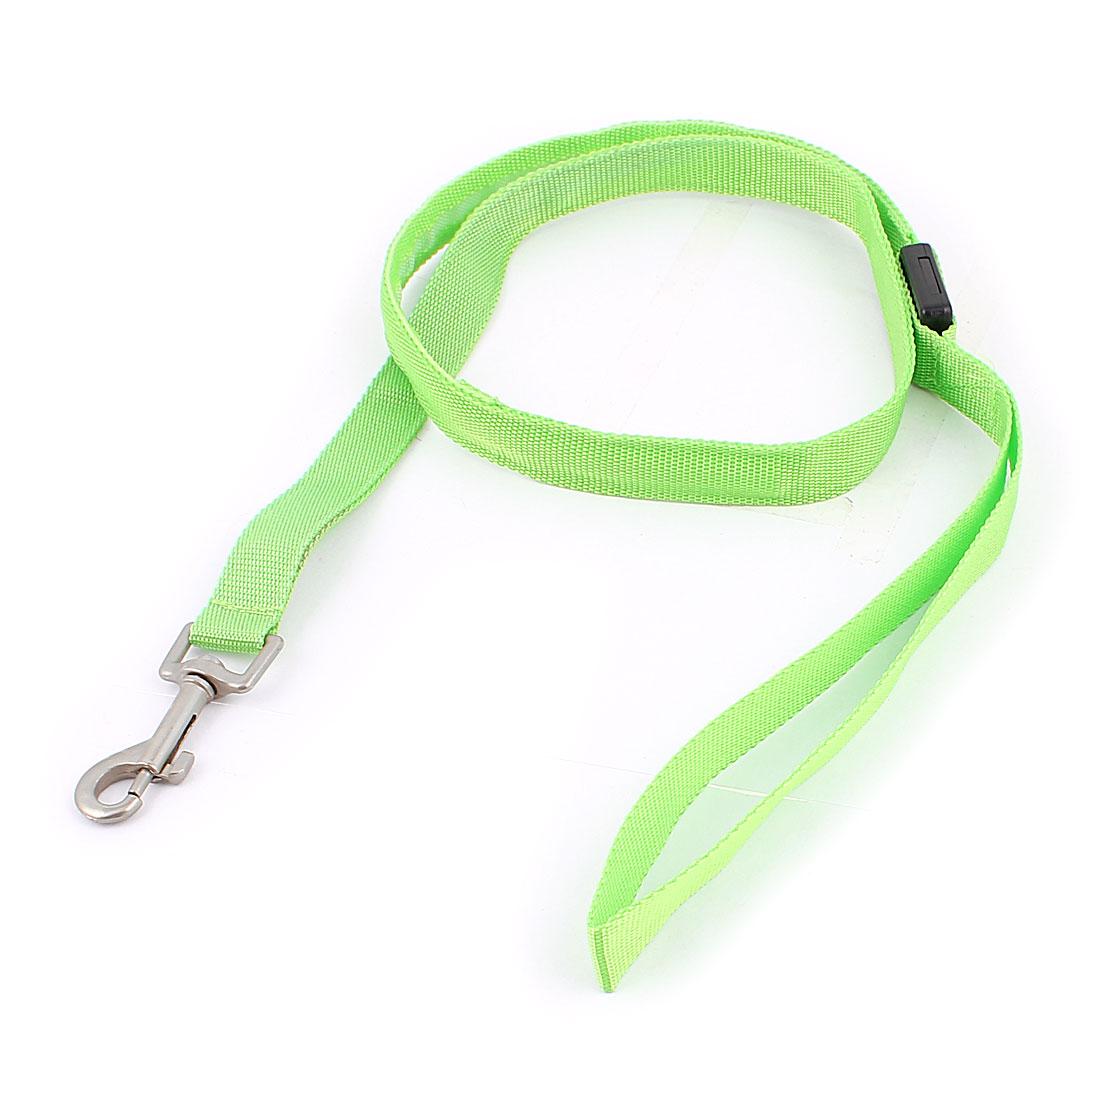 Pet Dog LED Flash Light Swivel Hook Training Walk Nylon Lead Leash Rope Green